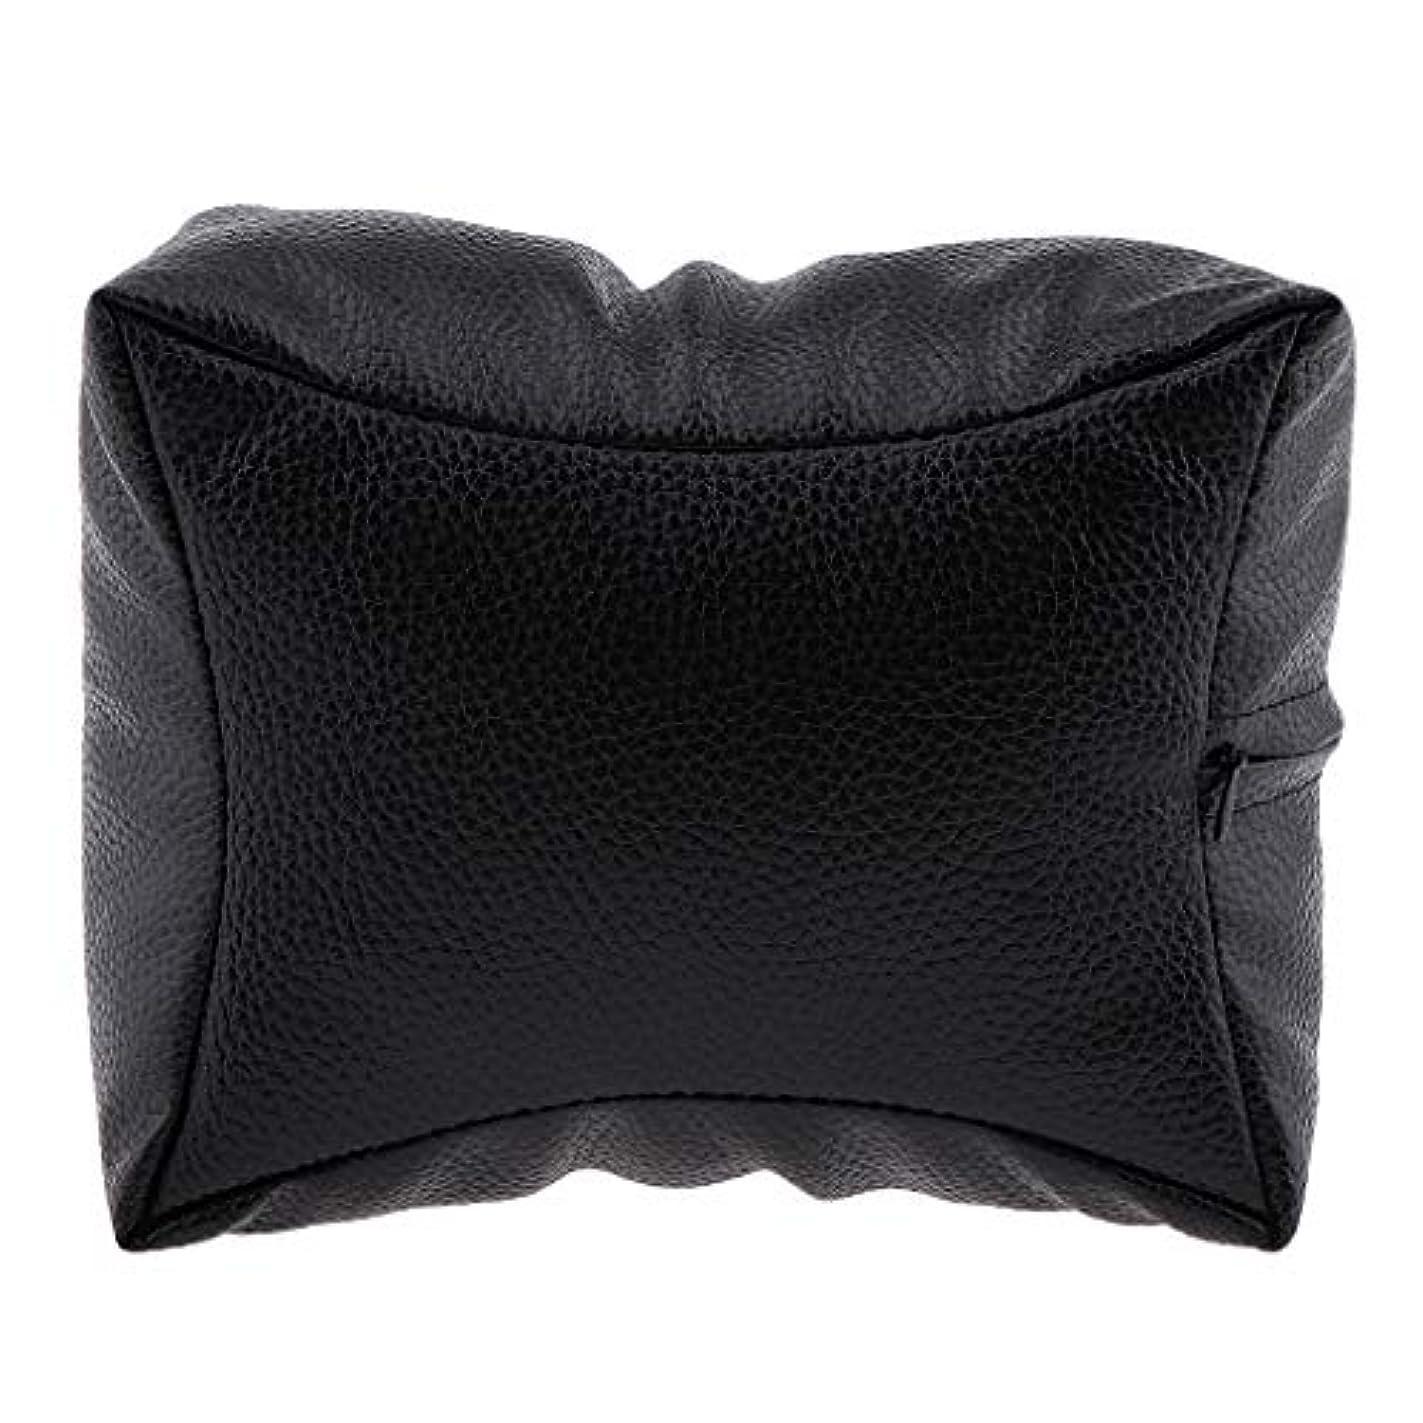 DYNWAVE 手枕 ハンドピロー ハンドクッション ネイルアート 個人 家庭 ネイルサロン 4色選べ - ブラック